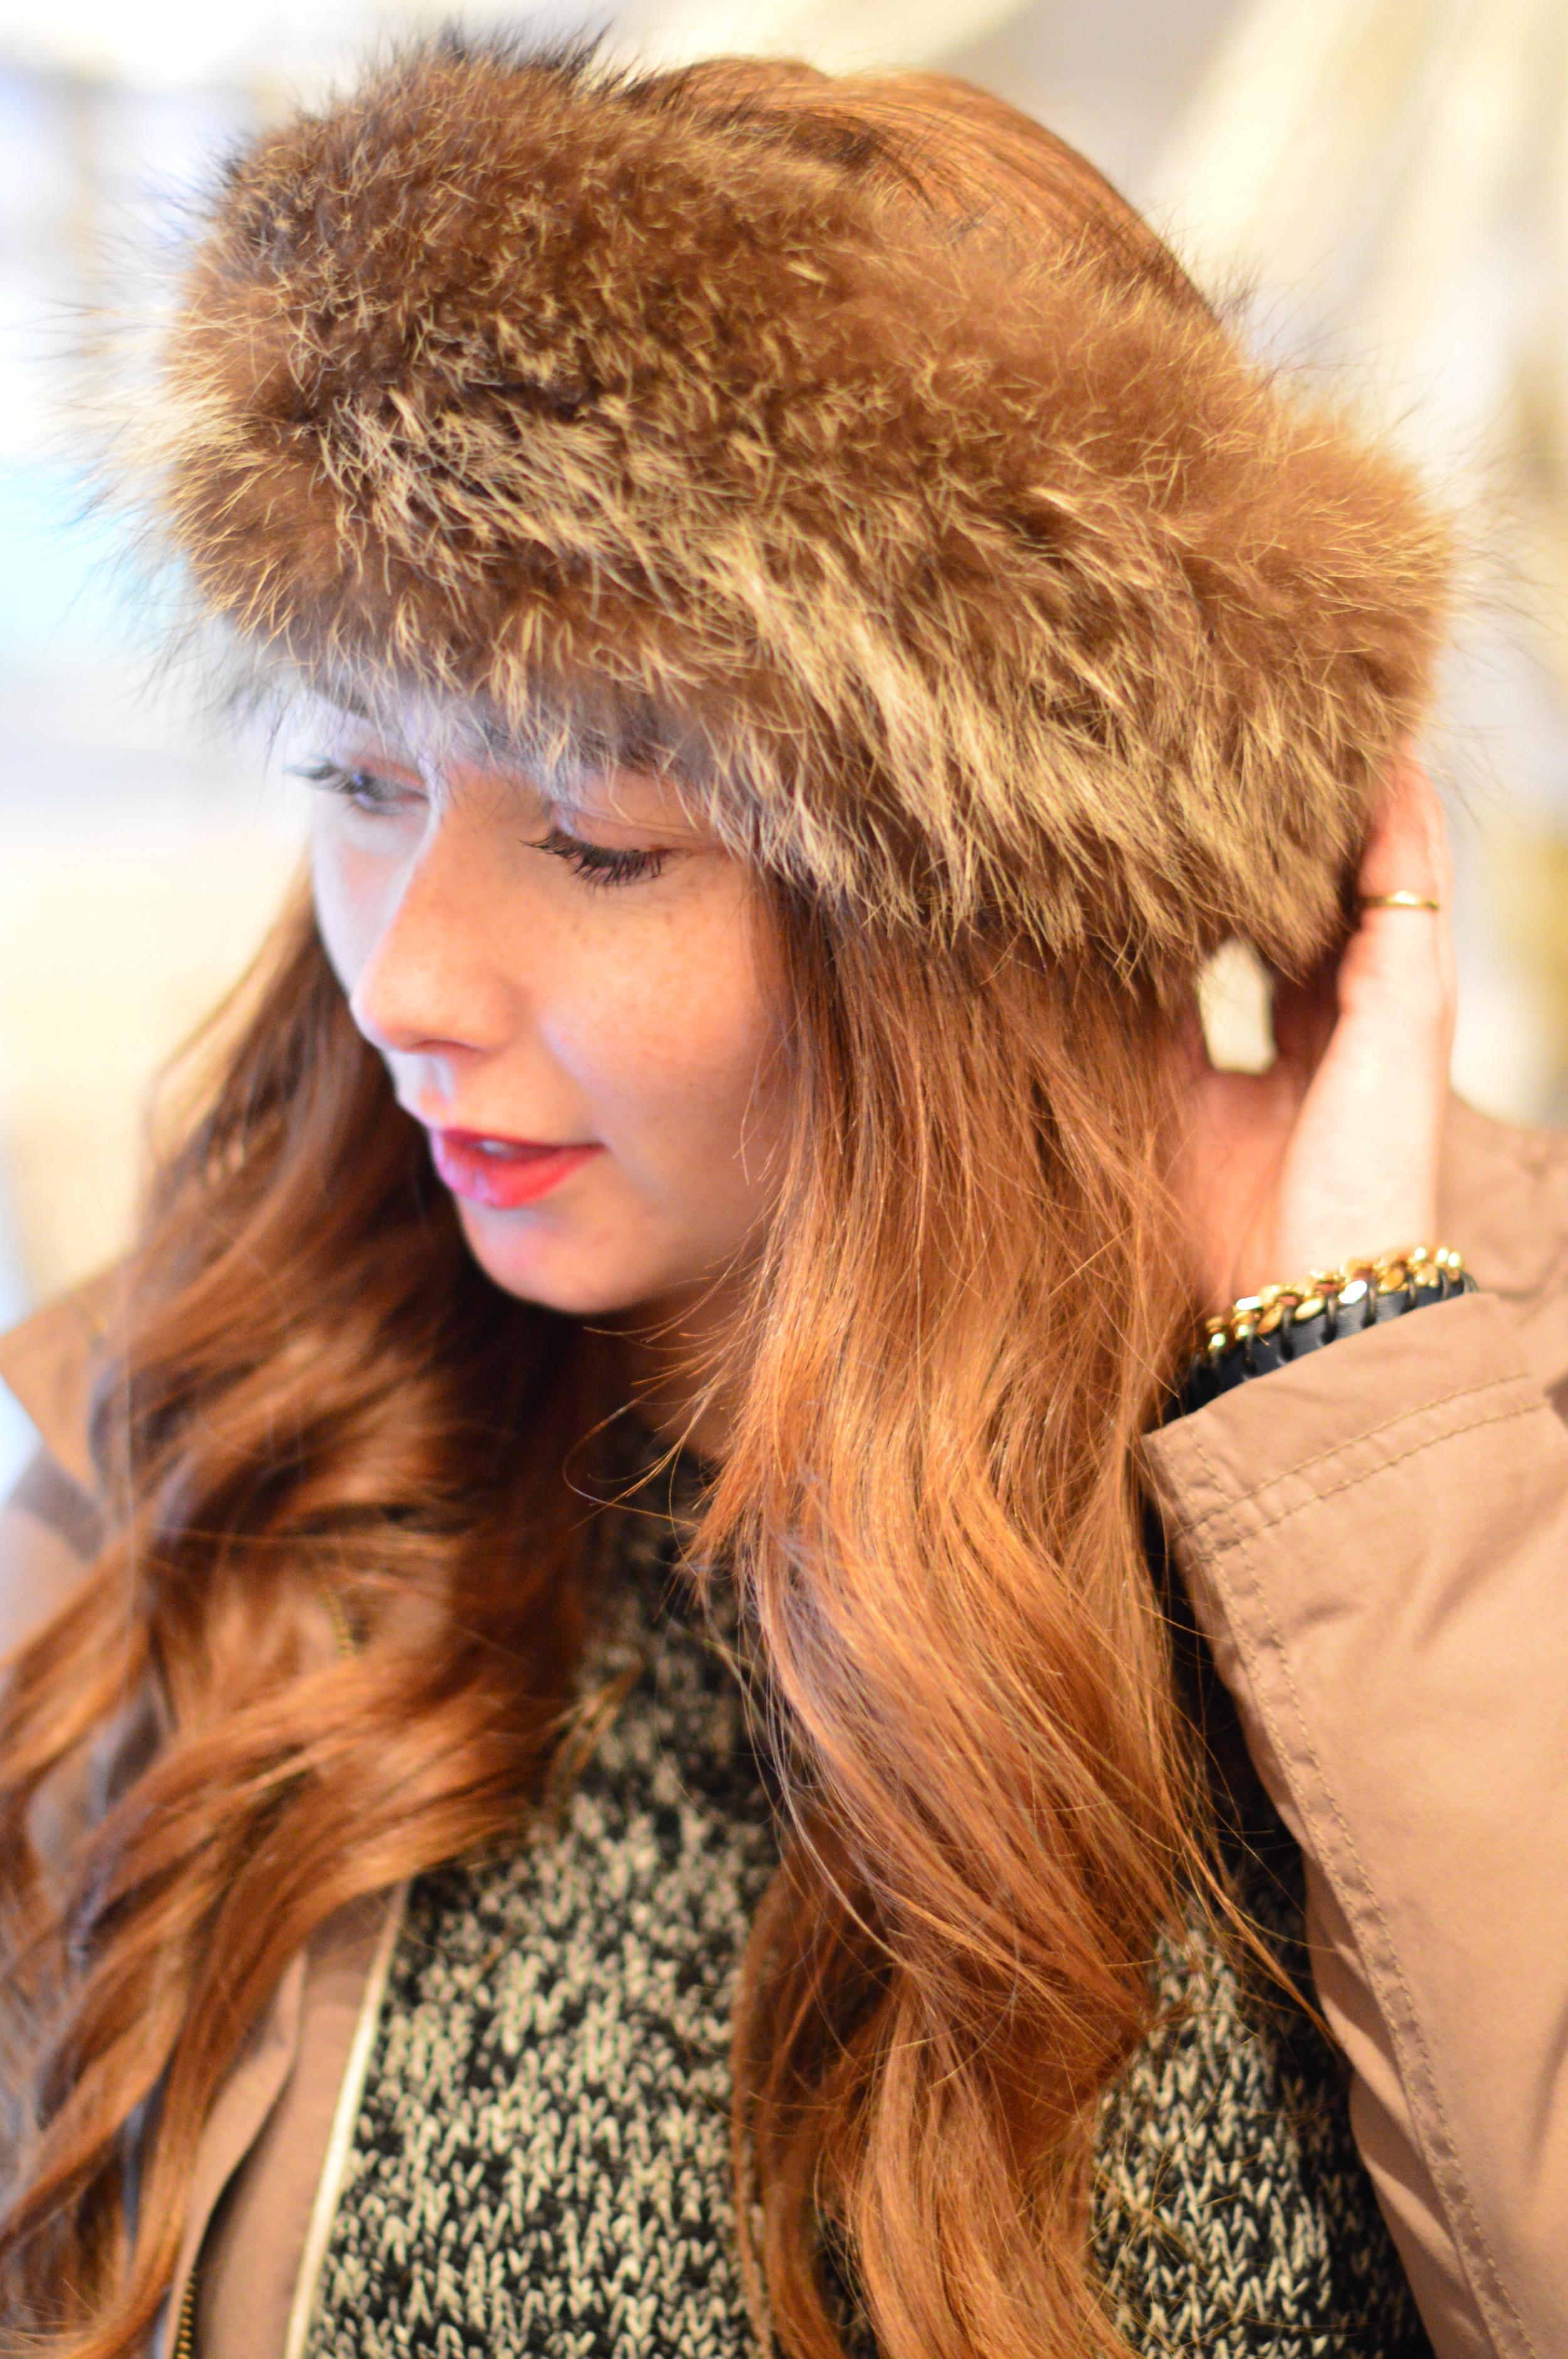 Headmistress Shania fur headband, Brave Leather Tikiki bracelet